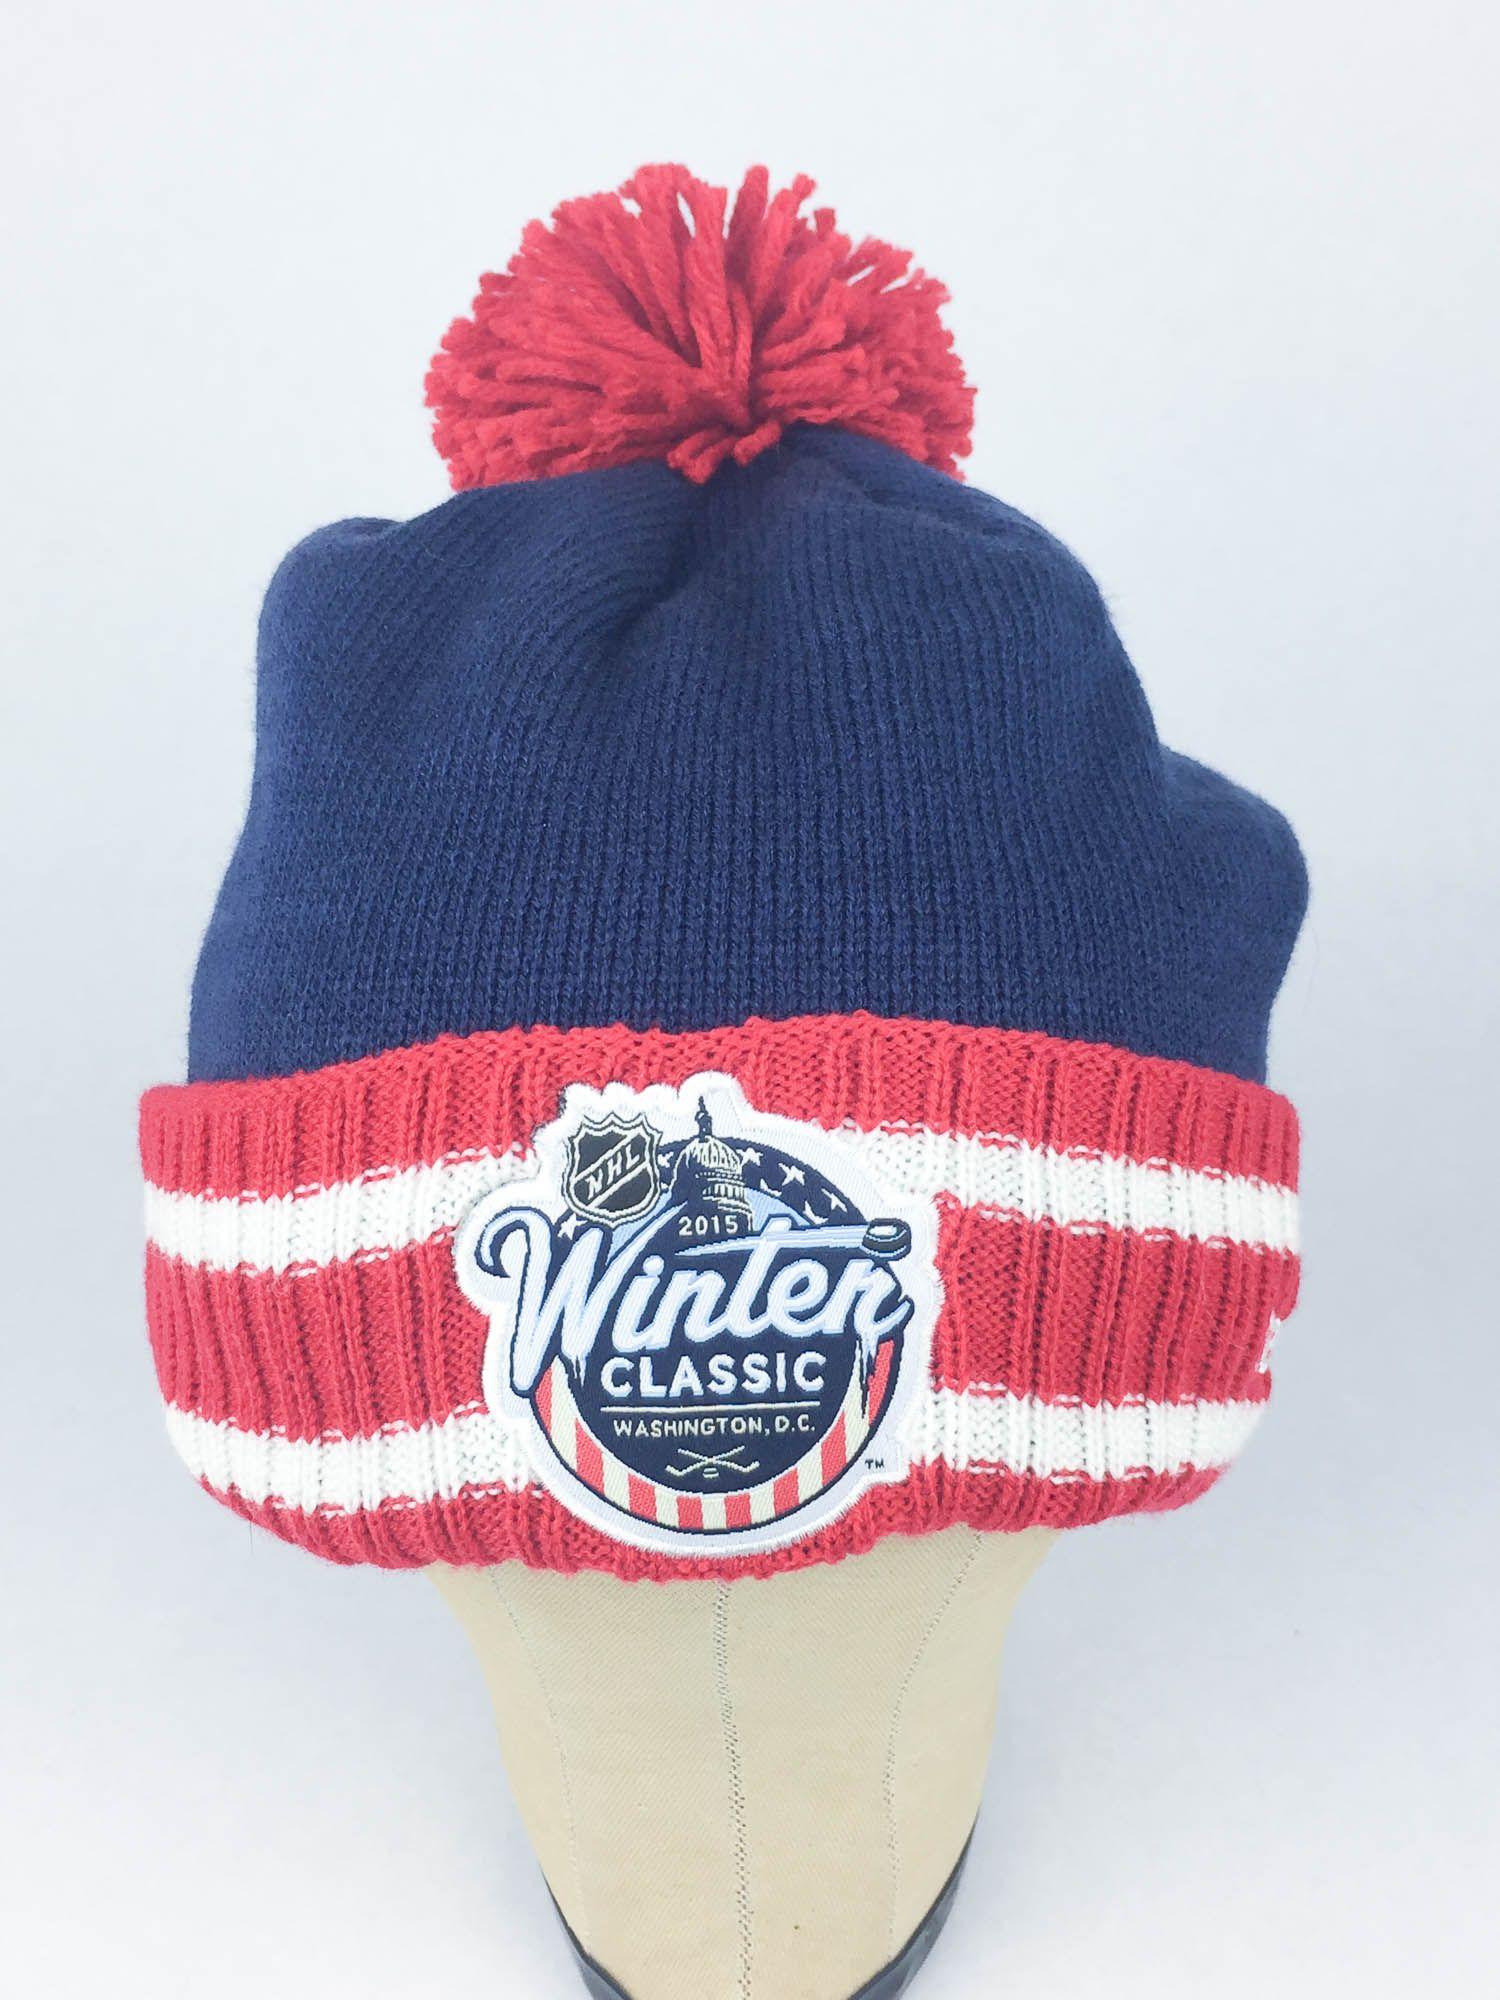 706ae4cbc1c286 NHL 2015 Winter Classic - Washington DC - Knit Pom Hat by Reebok on  Blamm.com